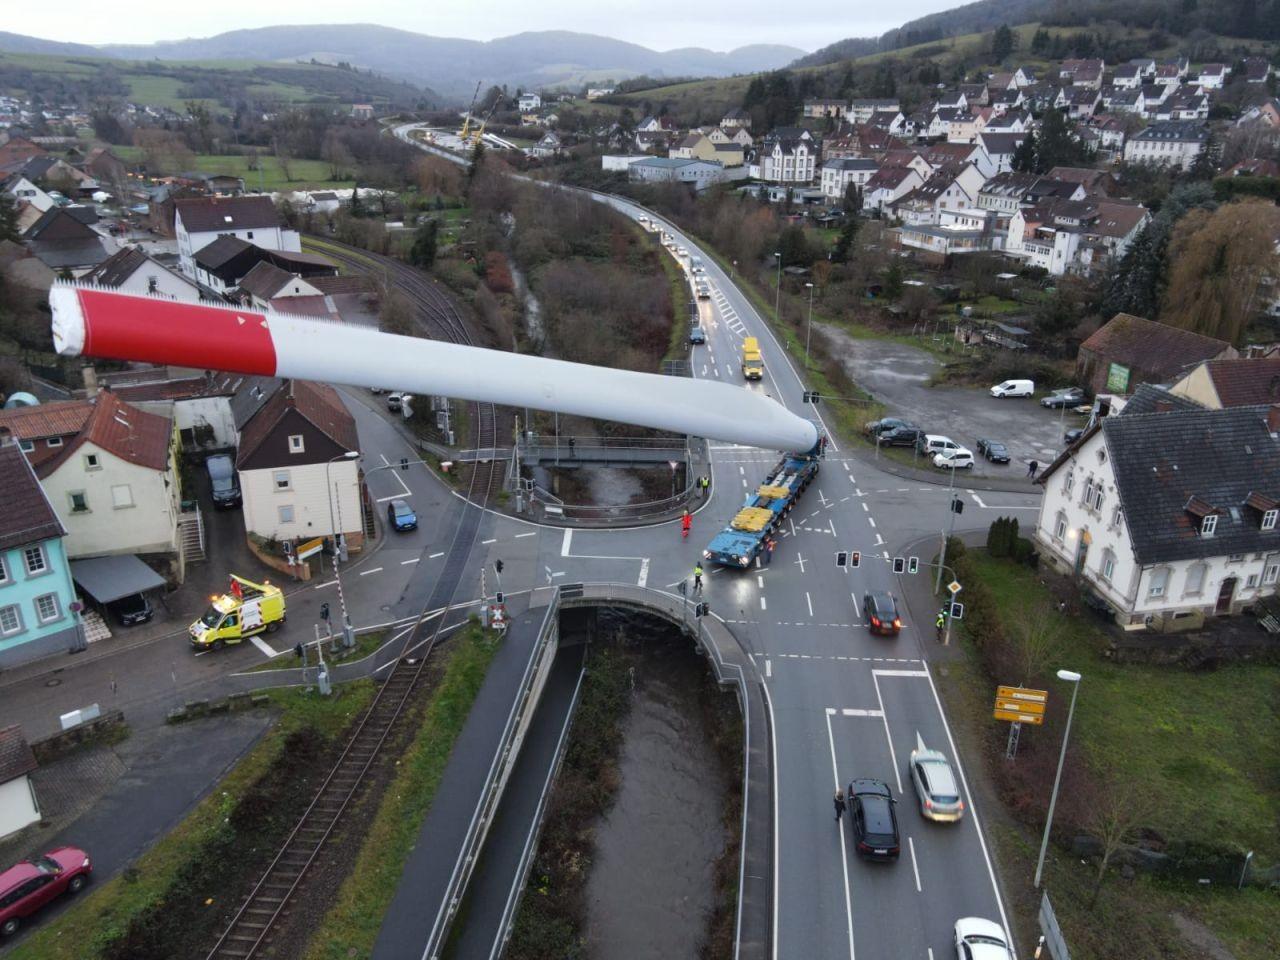 Amazing images show transport of 67-metre-long turbine blade